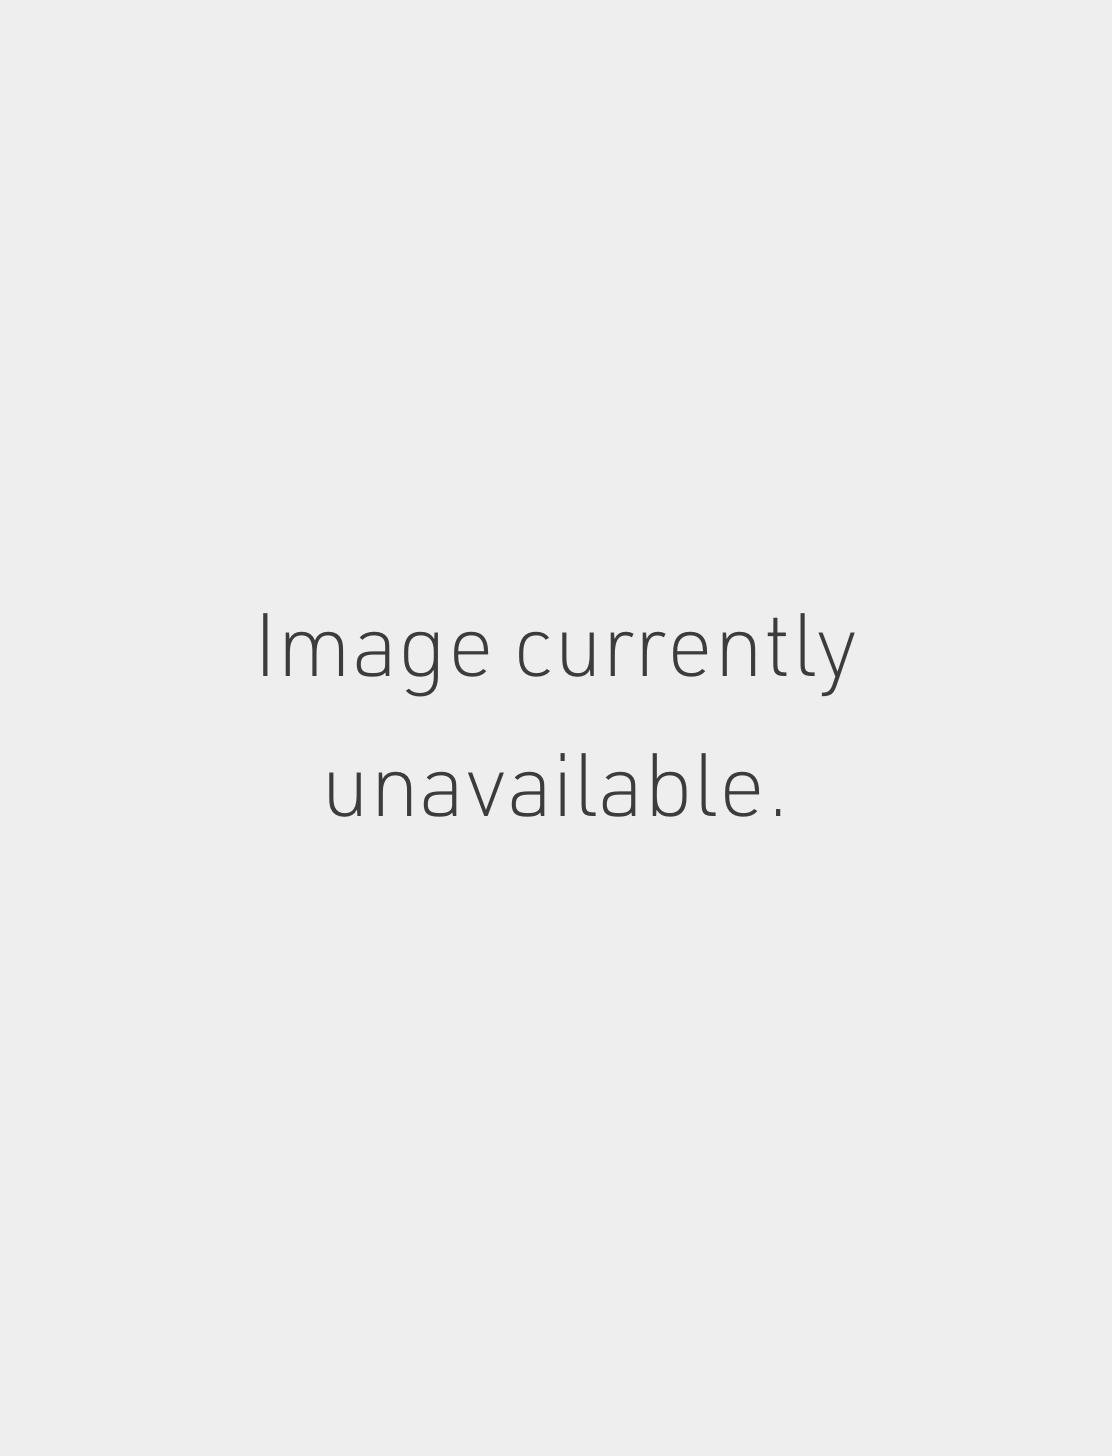 Diamond Drape Chadelier Threaded Stud Earring Image #1